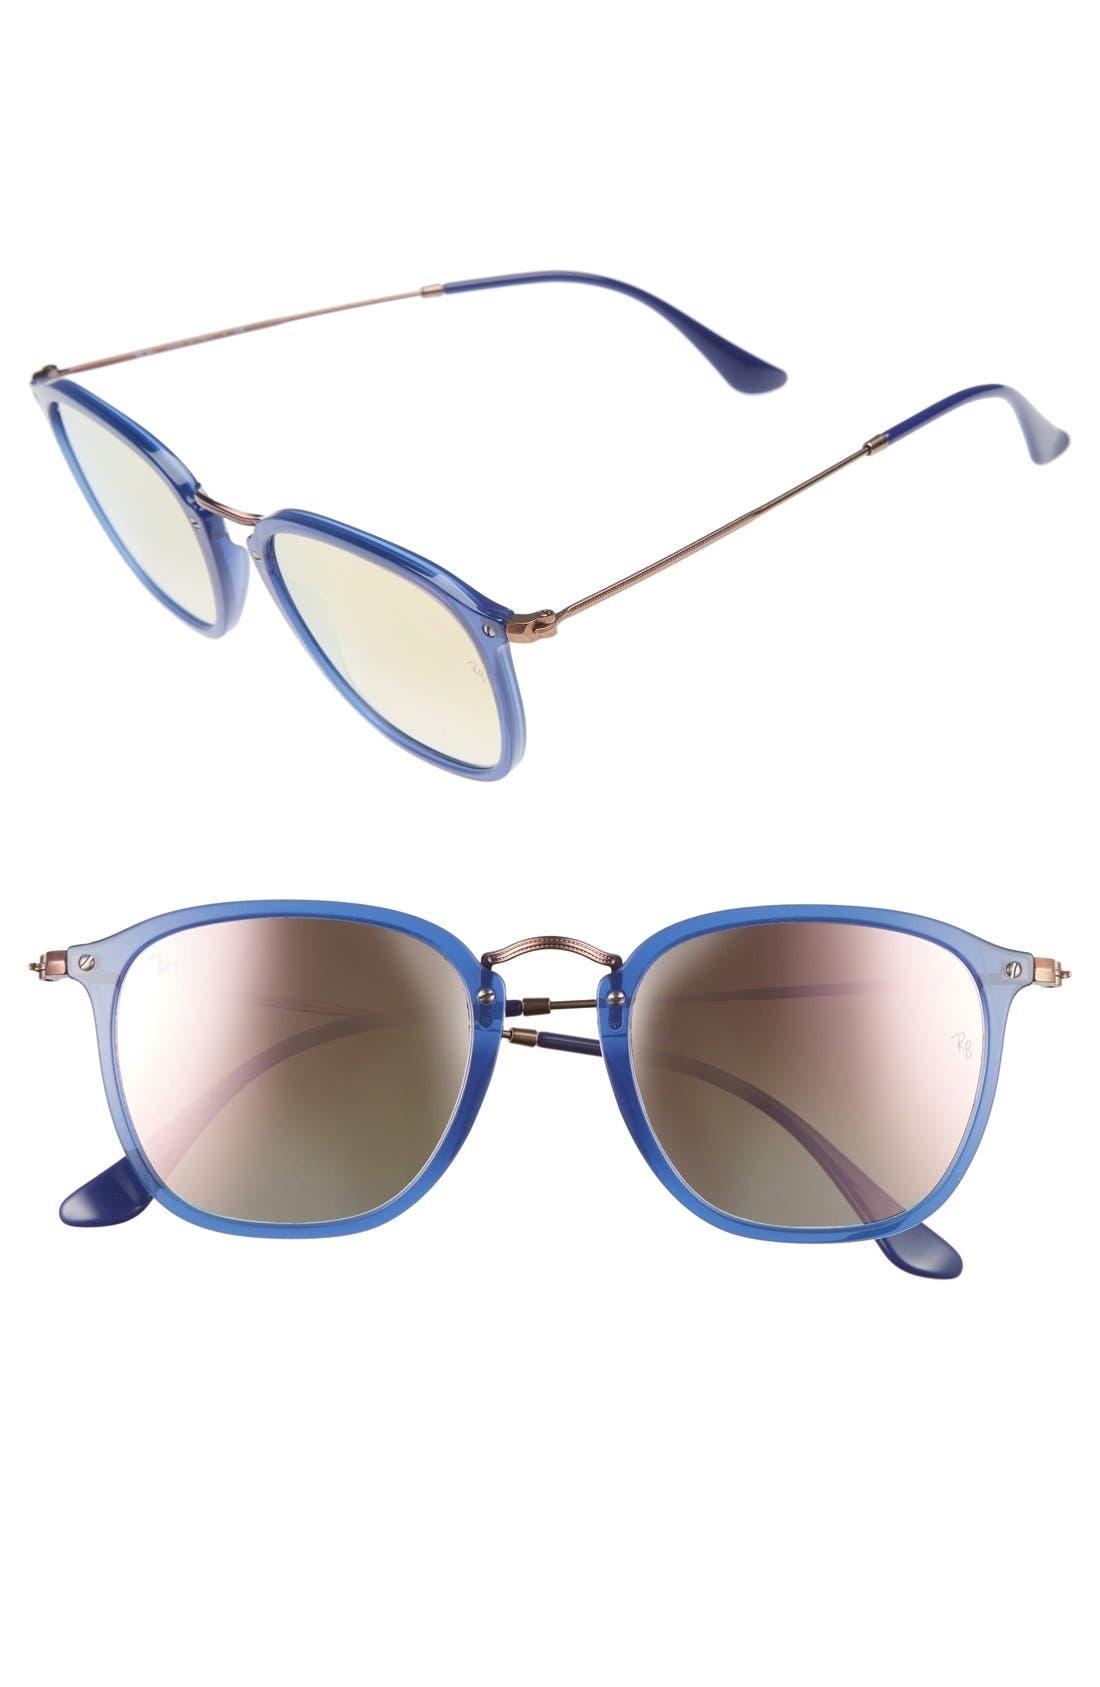 Icons Wayfarer 51mm Sunglasses,                         Main,                         color, Transparent Blue